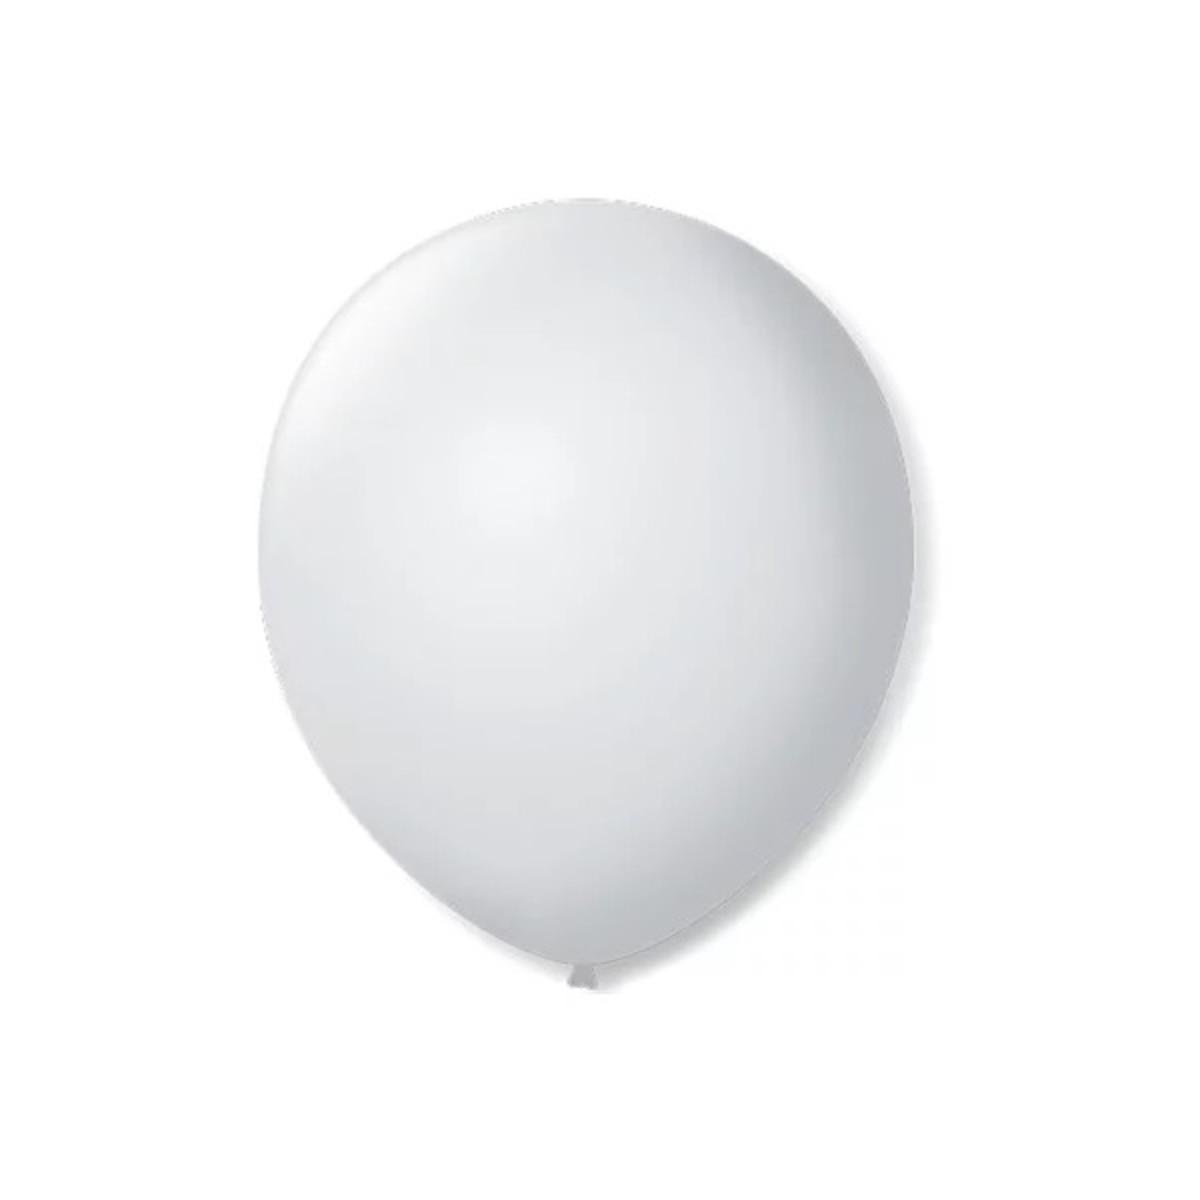 50 Unid Balão Bexiga Látex Branco Tamanho 7